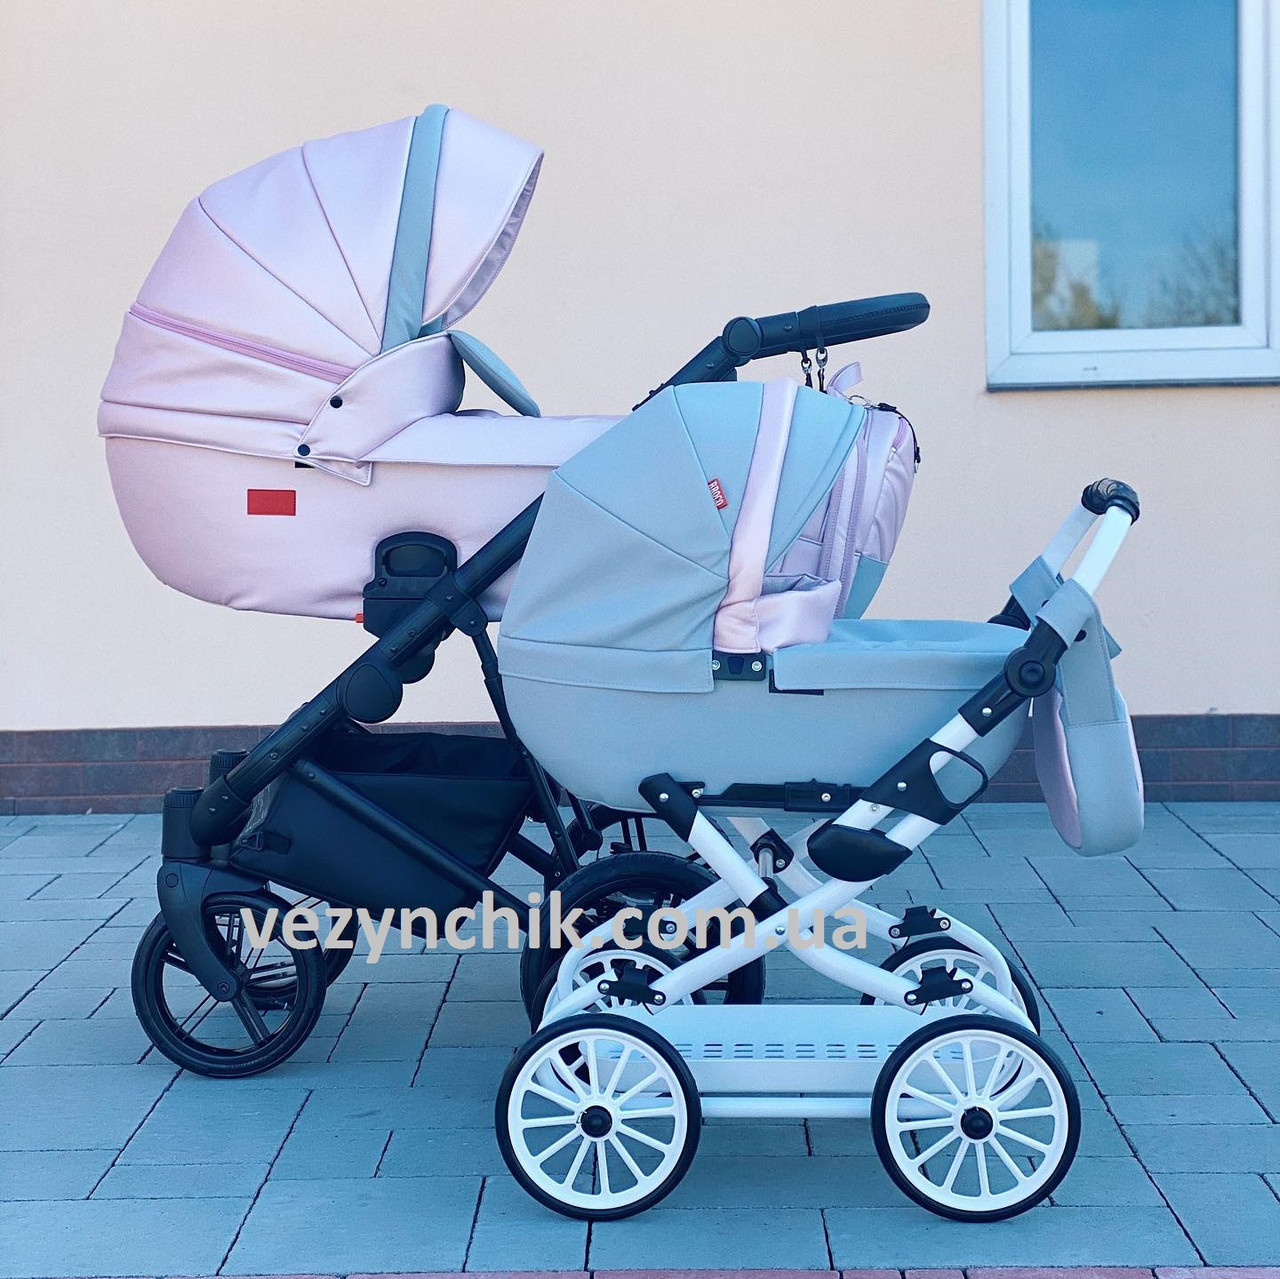 Коляска для куклы Broco Mini 2020 01 серо-розовый цвета в ассортименте (лялькова коляска)